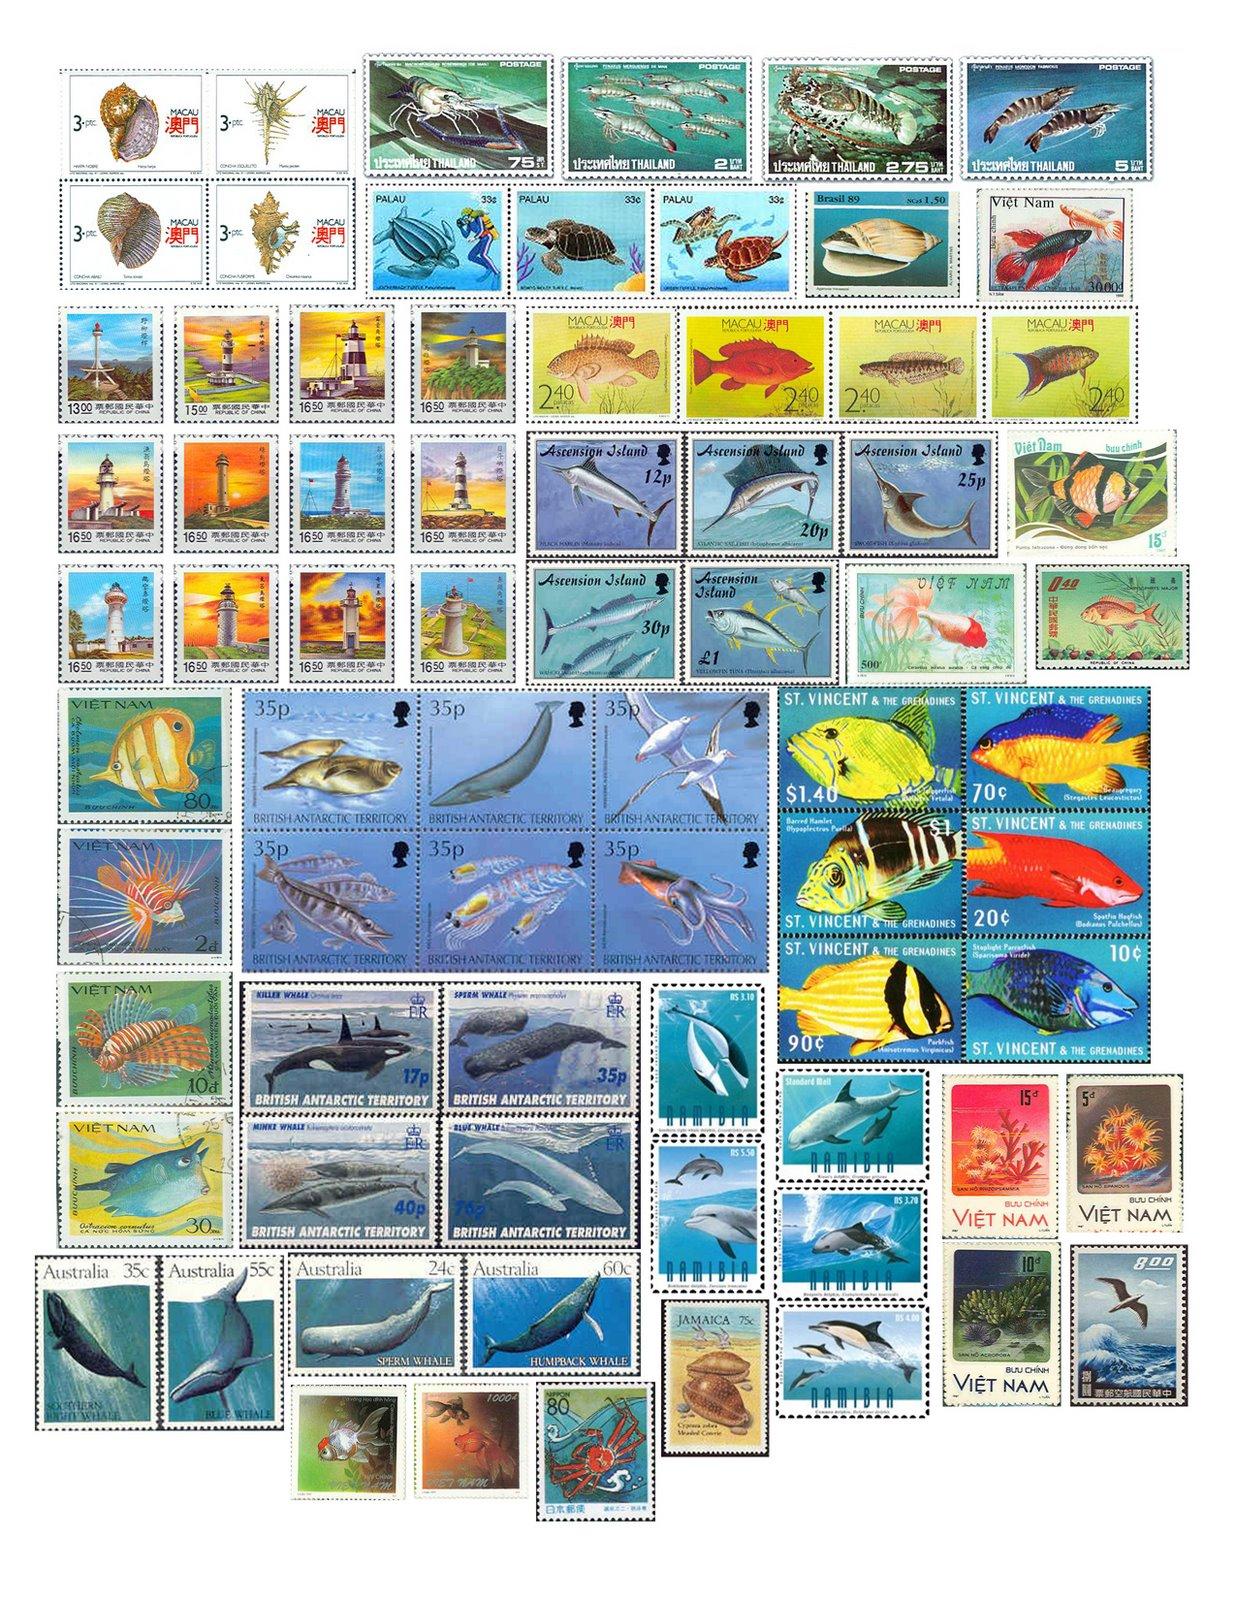 [Seashore+Stamps1150.jpg]